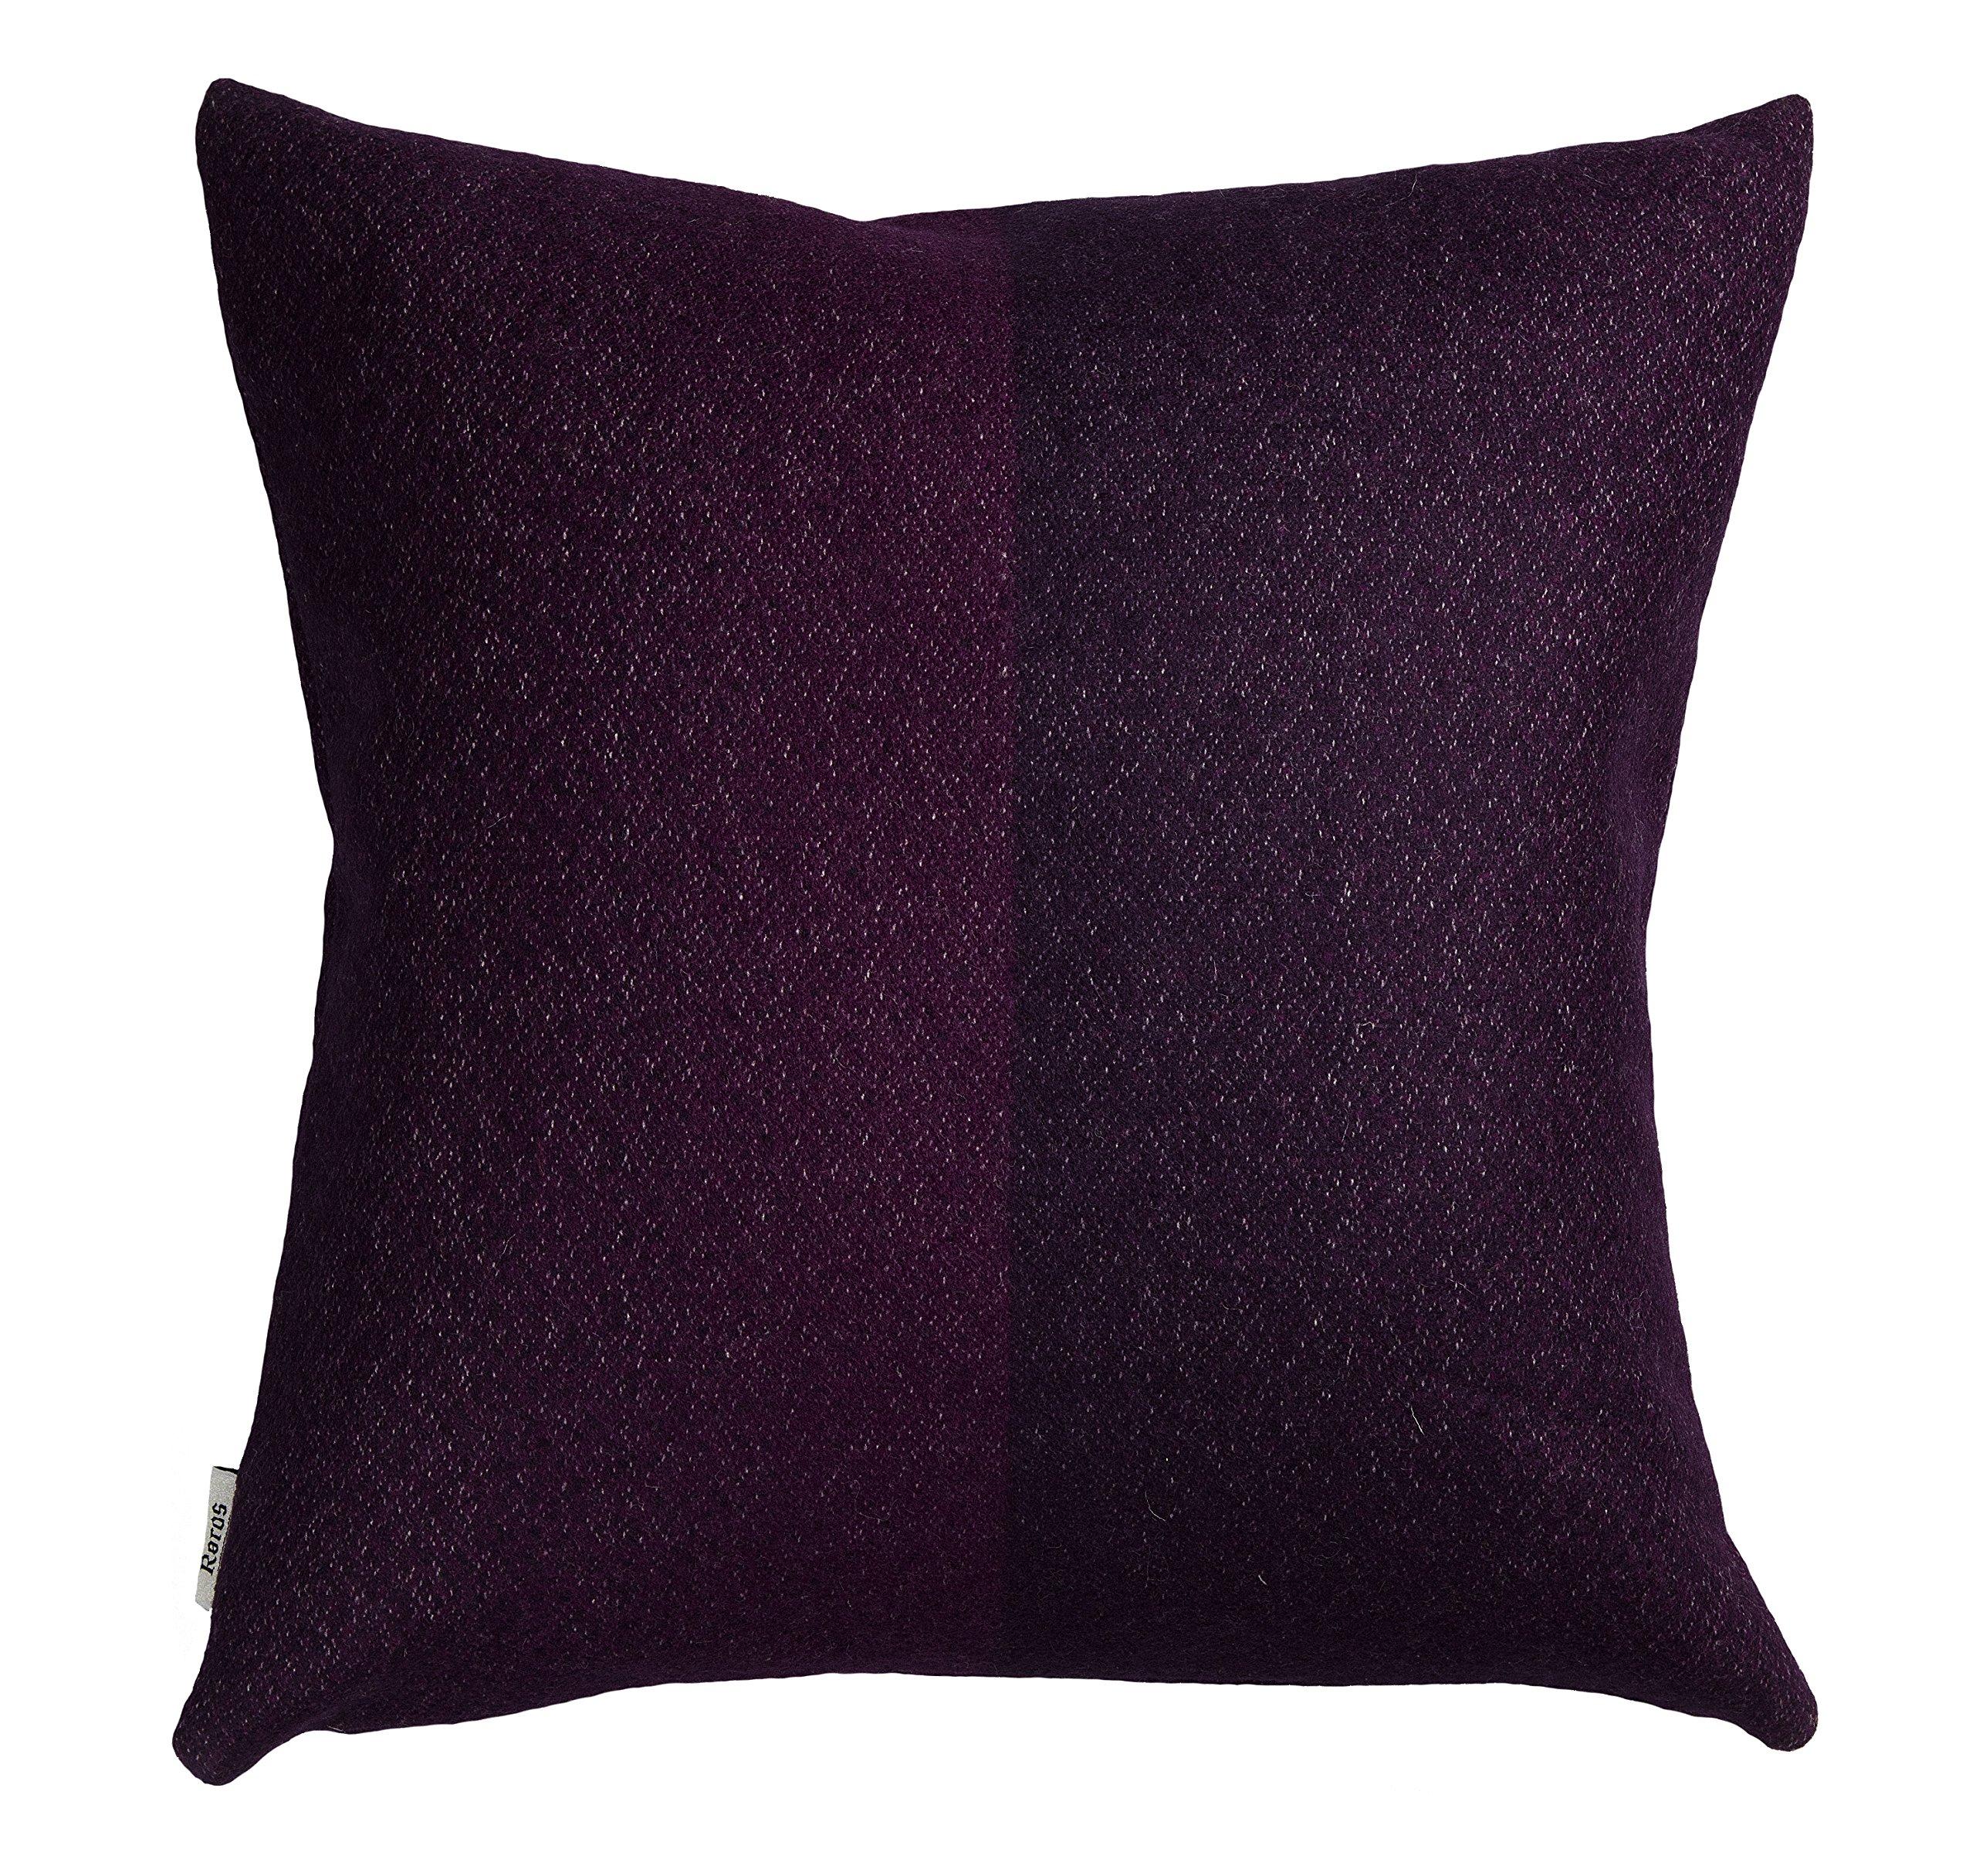 Roros Tweed 100% Norwegian Wool Reversible Designer Pillow Cushion (Berg in Violet)